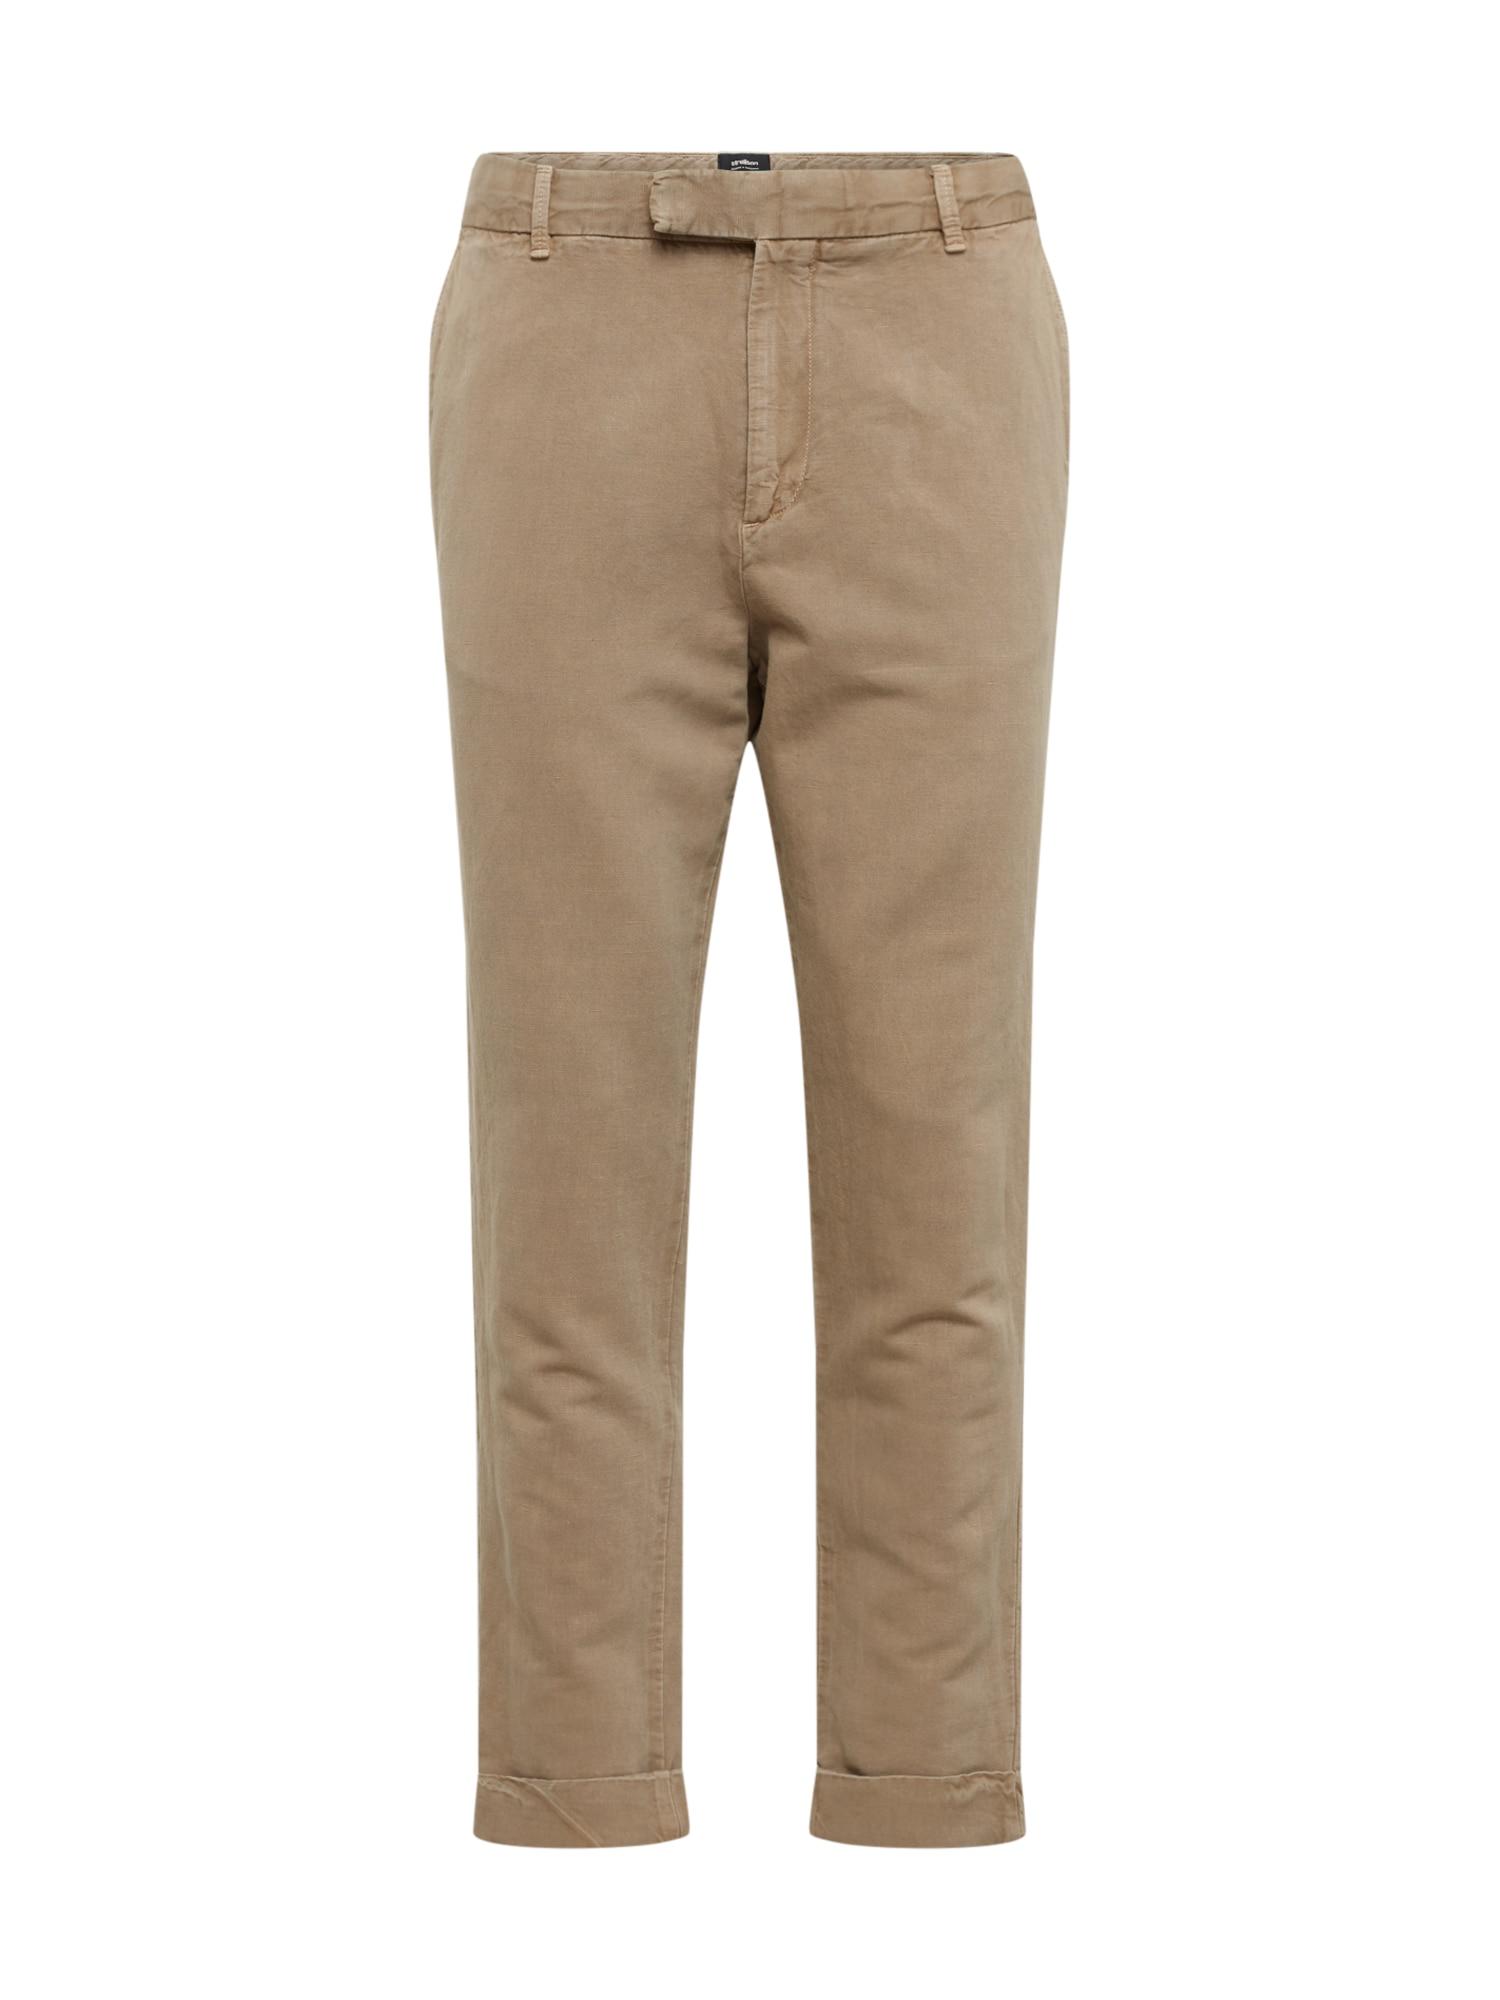 Chino kalhoty 11 Biant-D 10007511 béžová STRELLSON